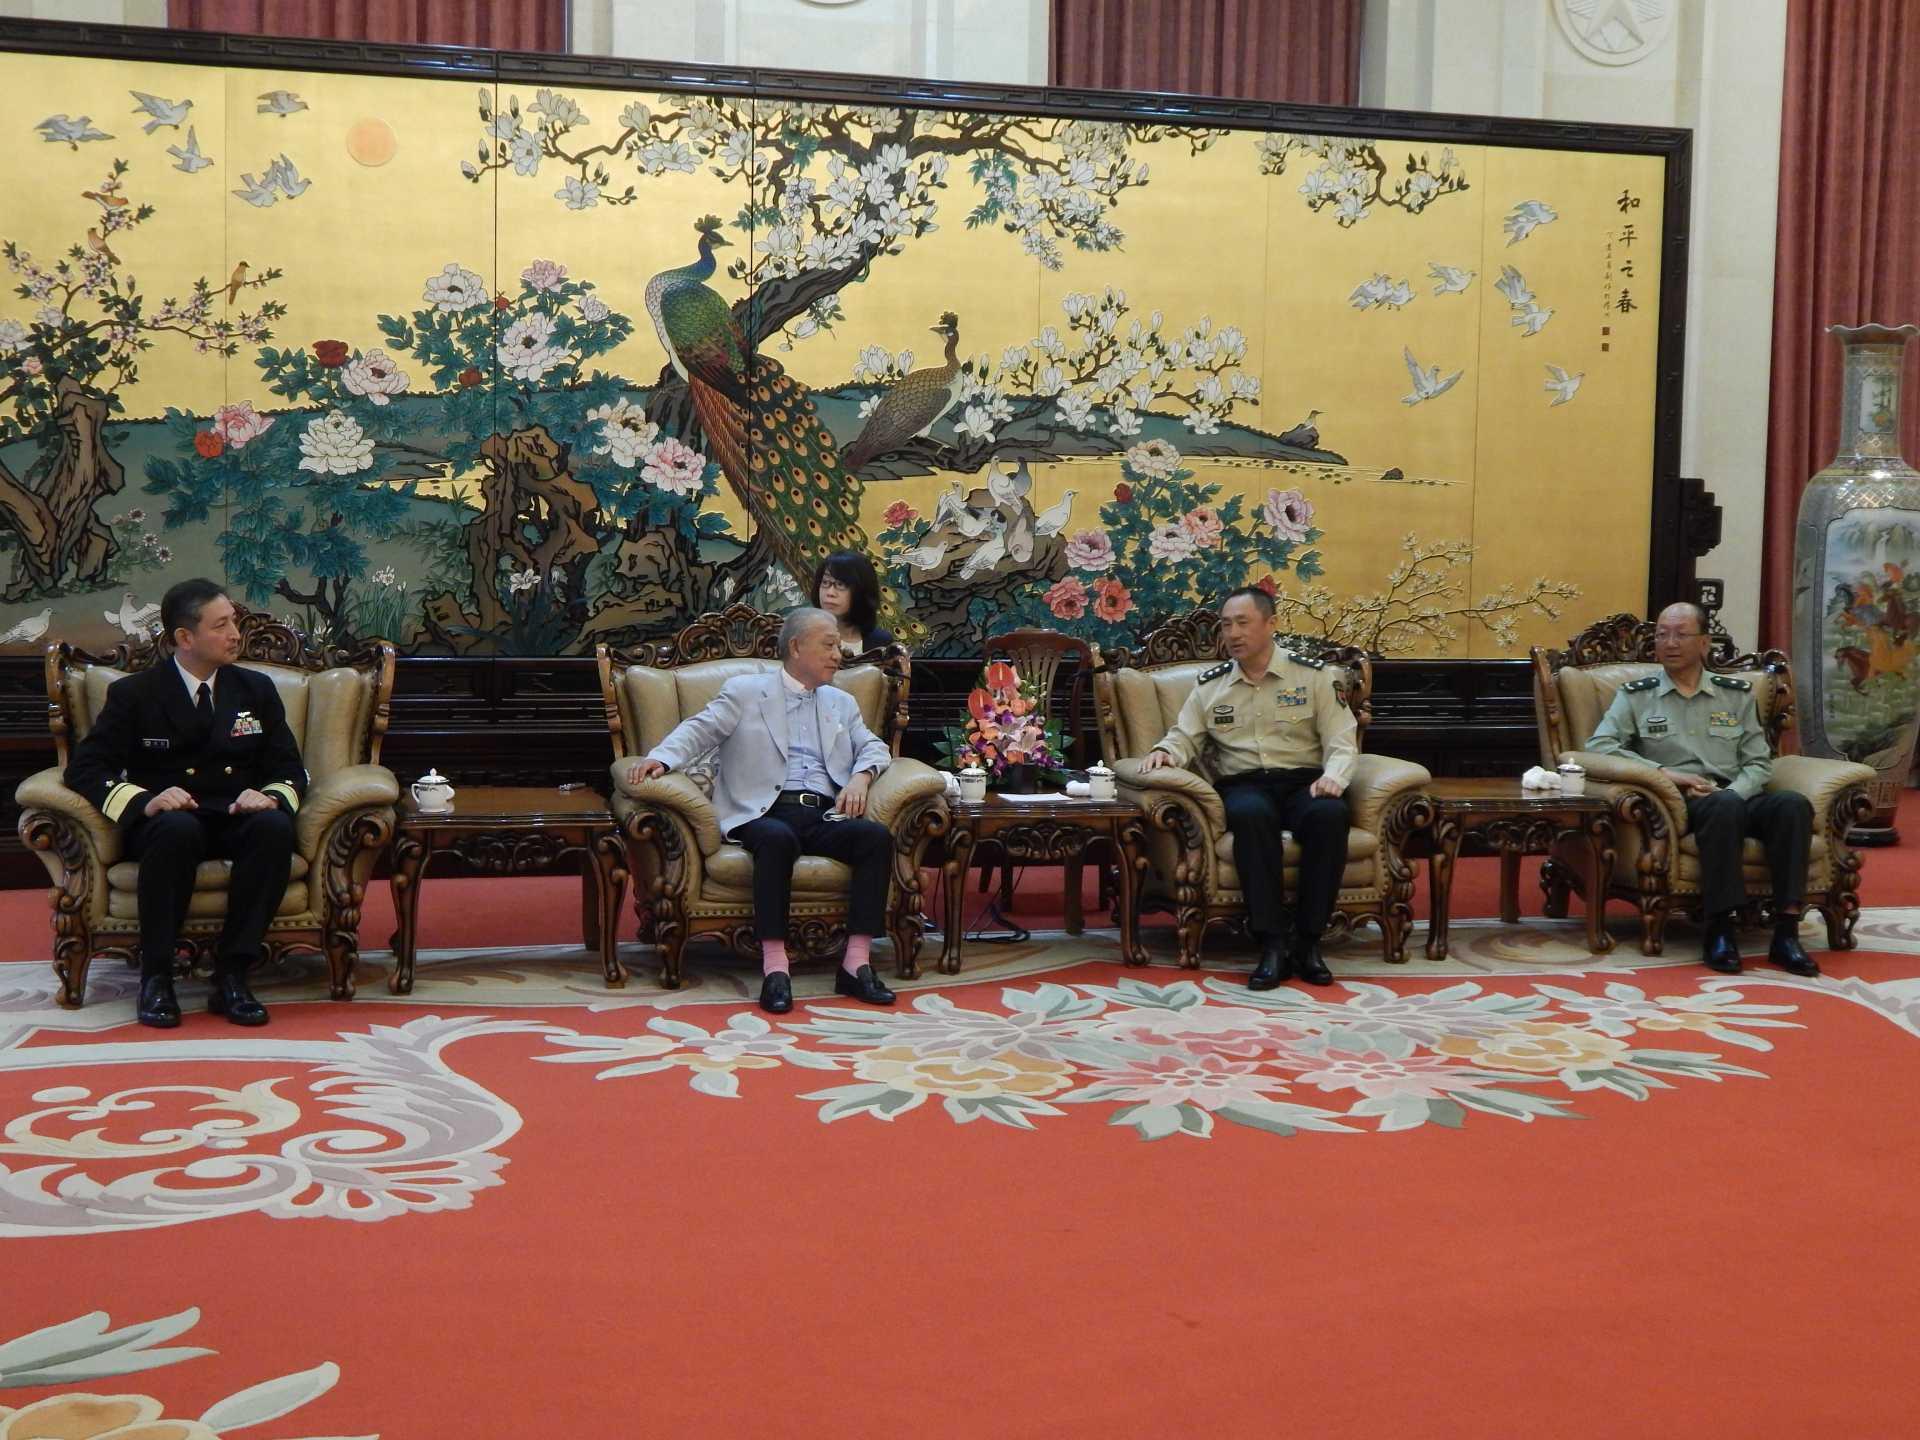 自衛隊の中国訪問団、PKOセンター視察 日中佐官級交流事業